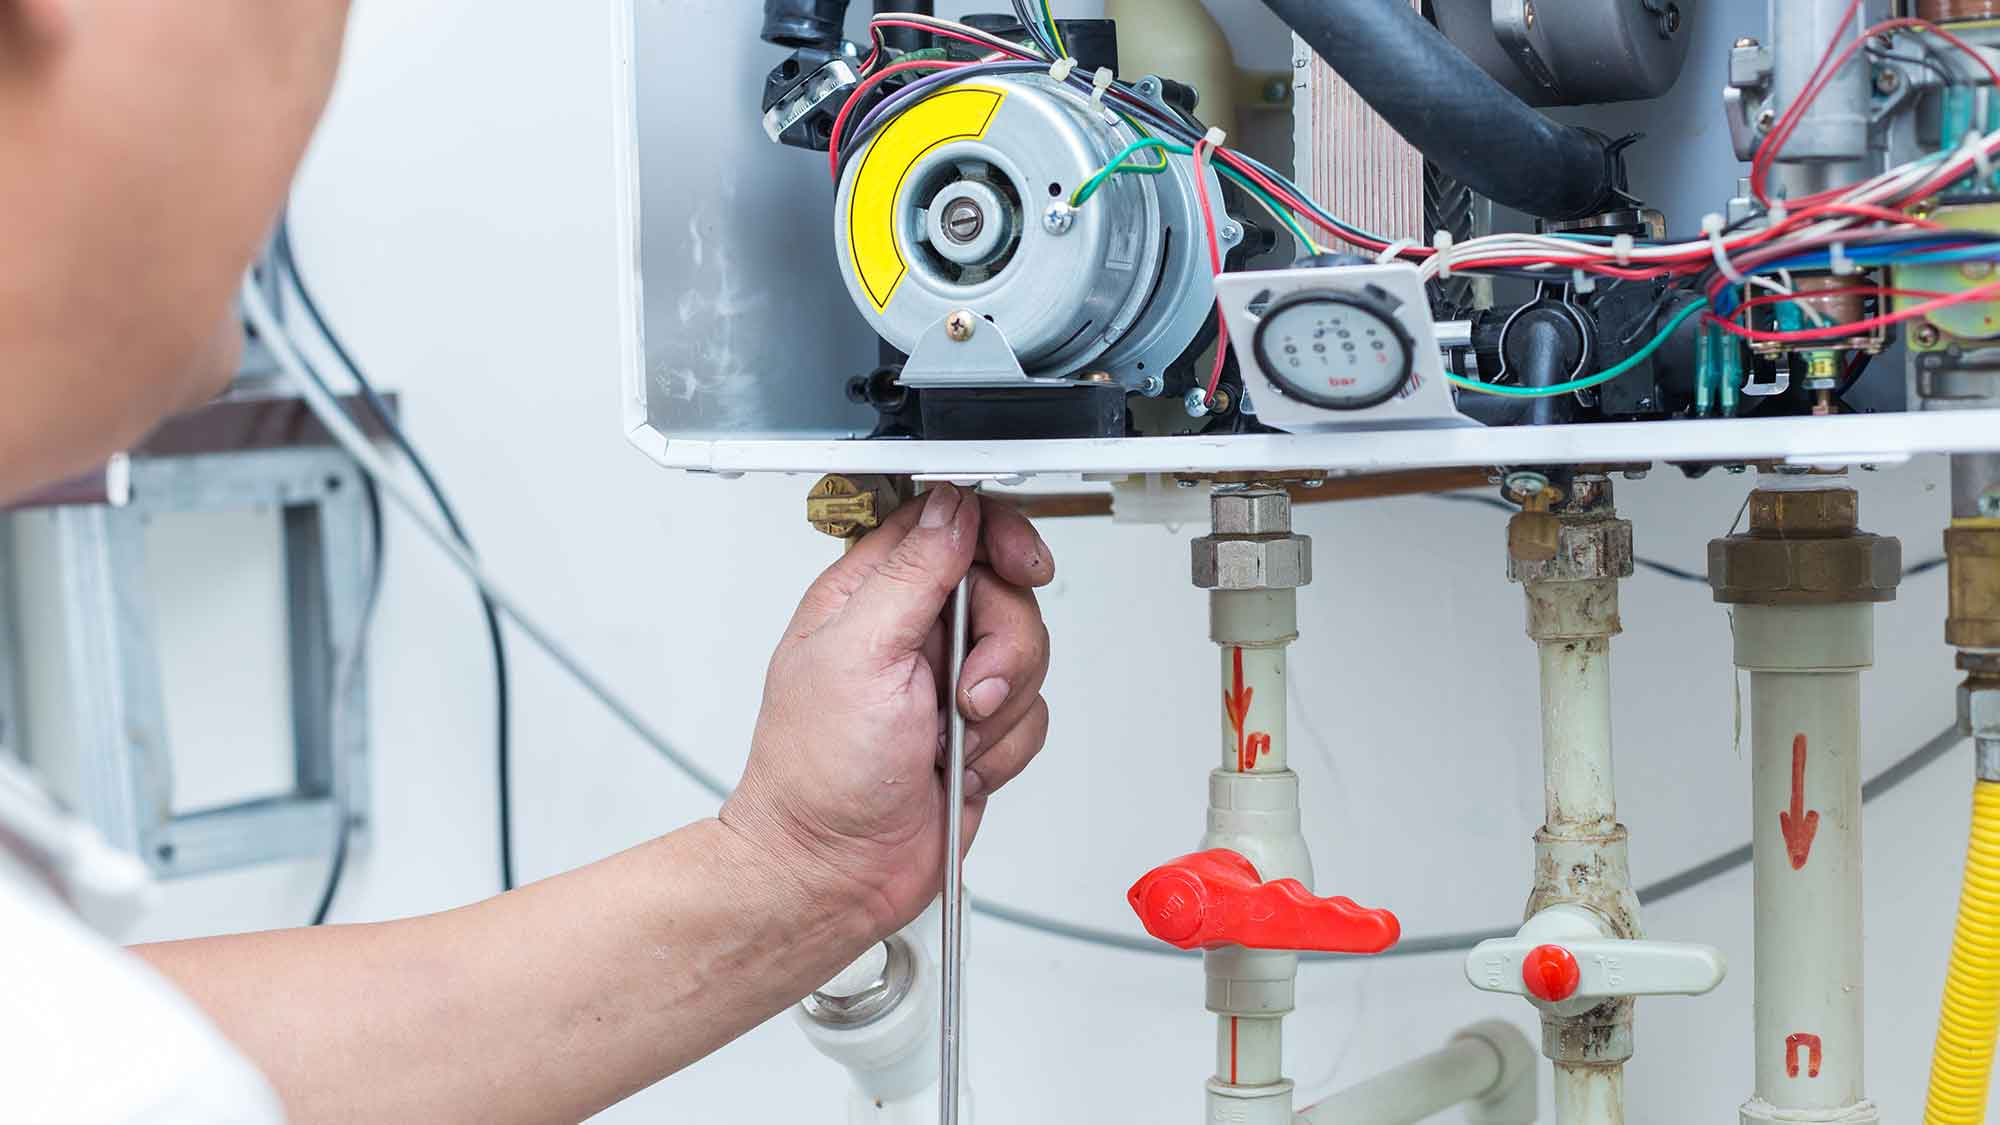 gas leak repair essex maintenance leigh on sea test